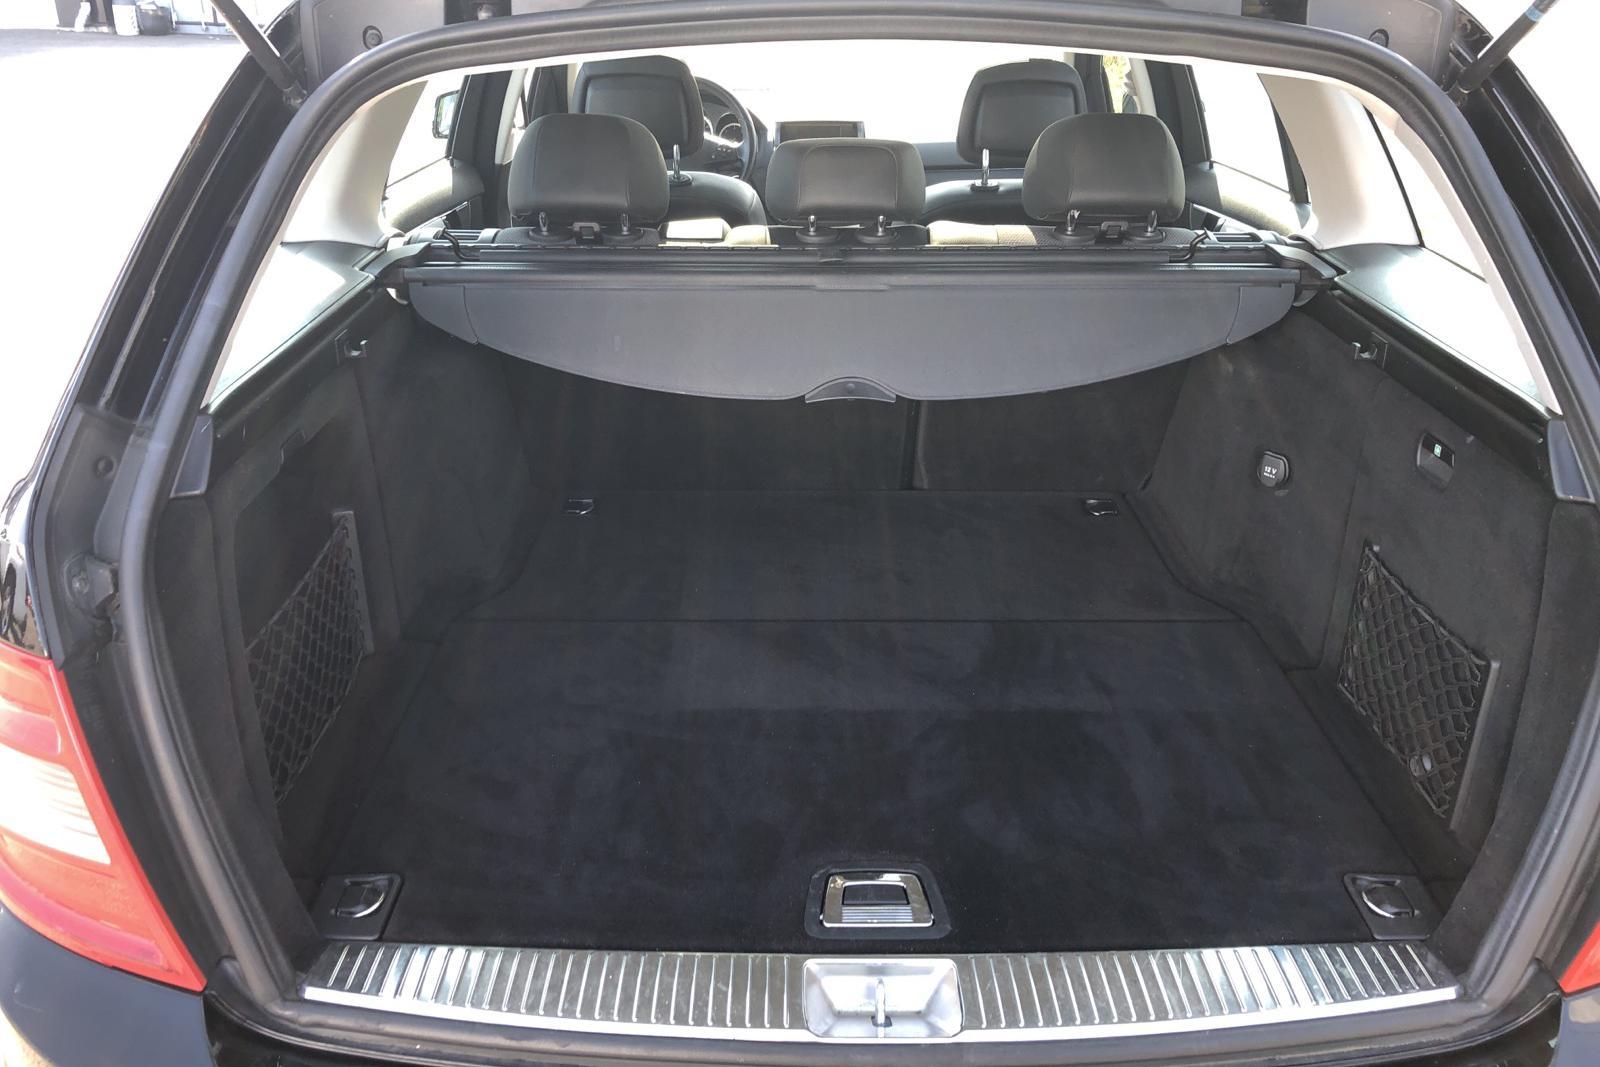 Mercedes C 220 CDI BlueEfficiency Kombi S204 (170hk) - 18 824 mil - Manuell - svart - 2010